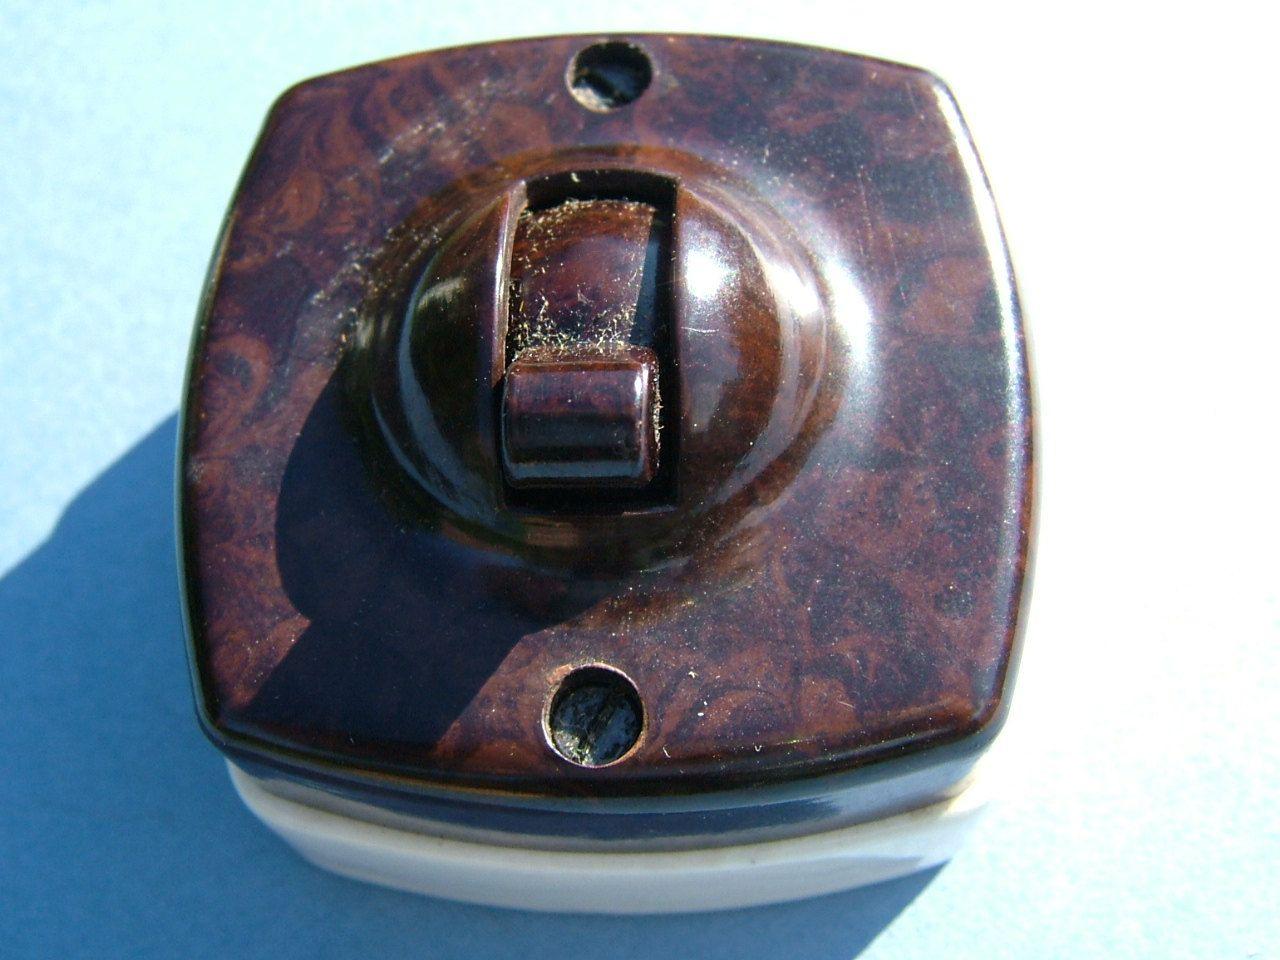 Little Briton Britmax 5 Amps 250 Volts Bakelite Light Switch In Original Box Light Switch Light Door Handles